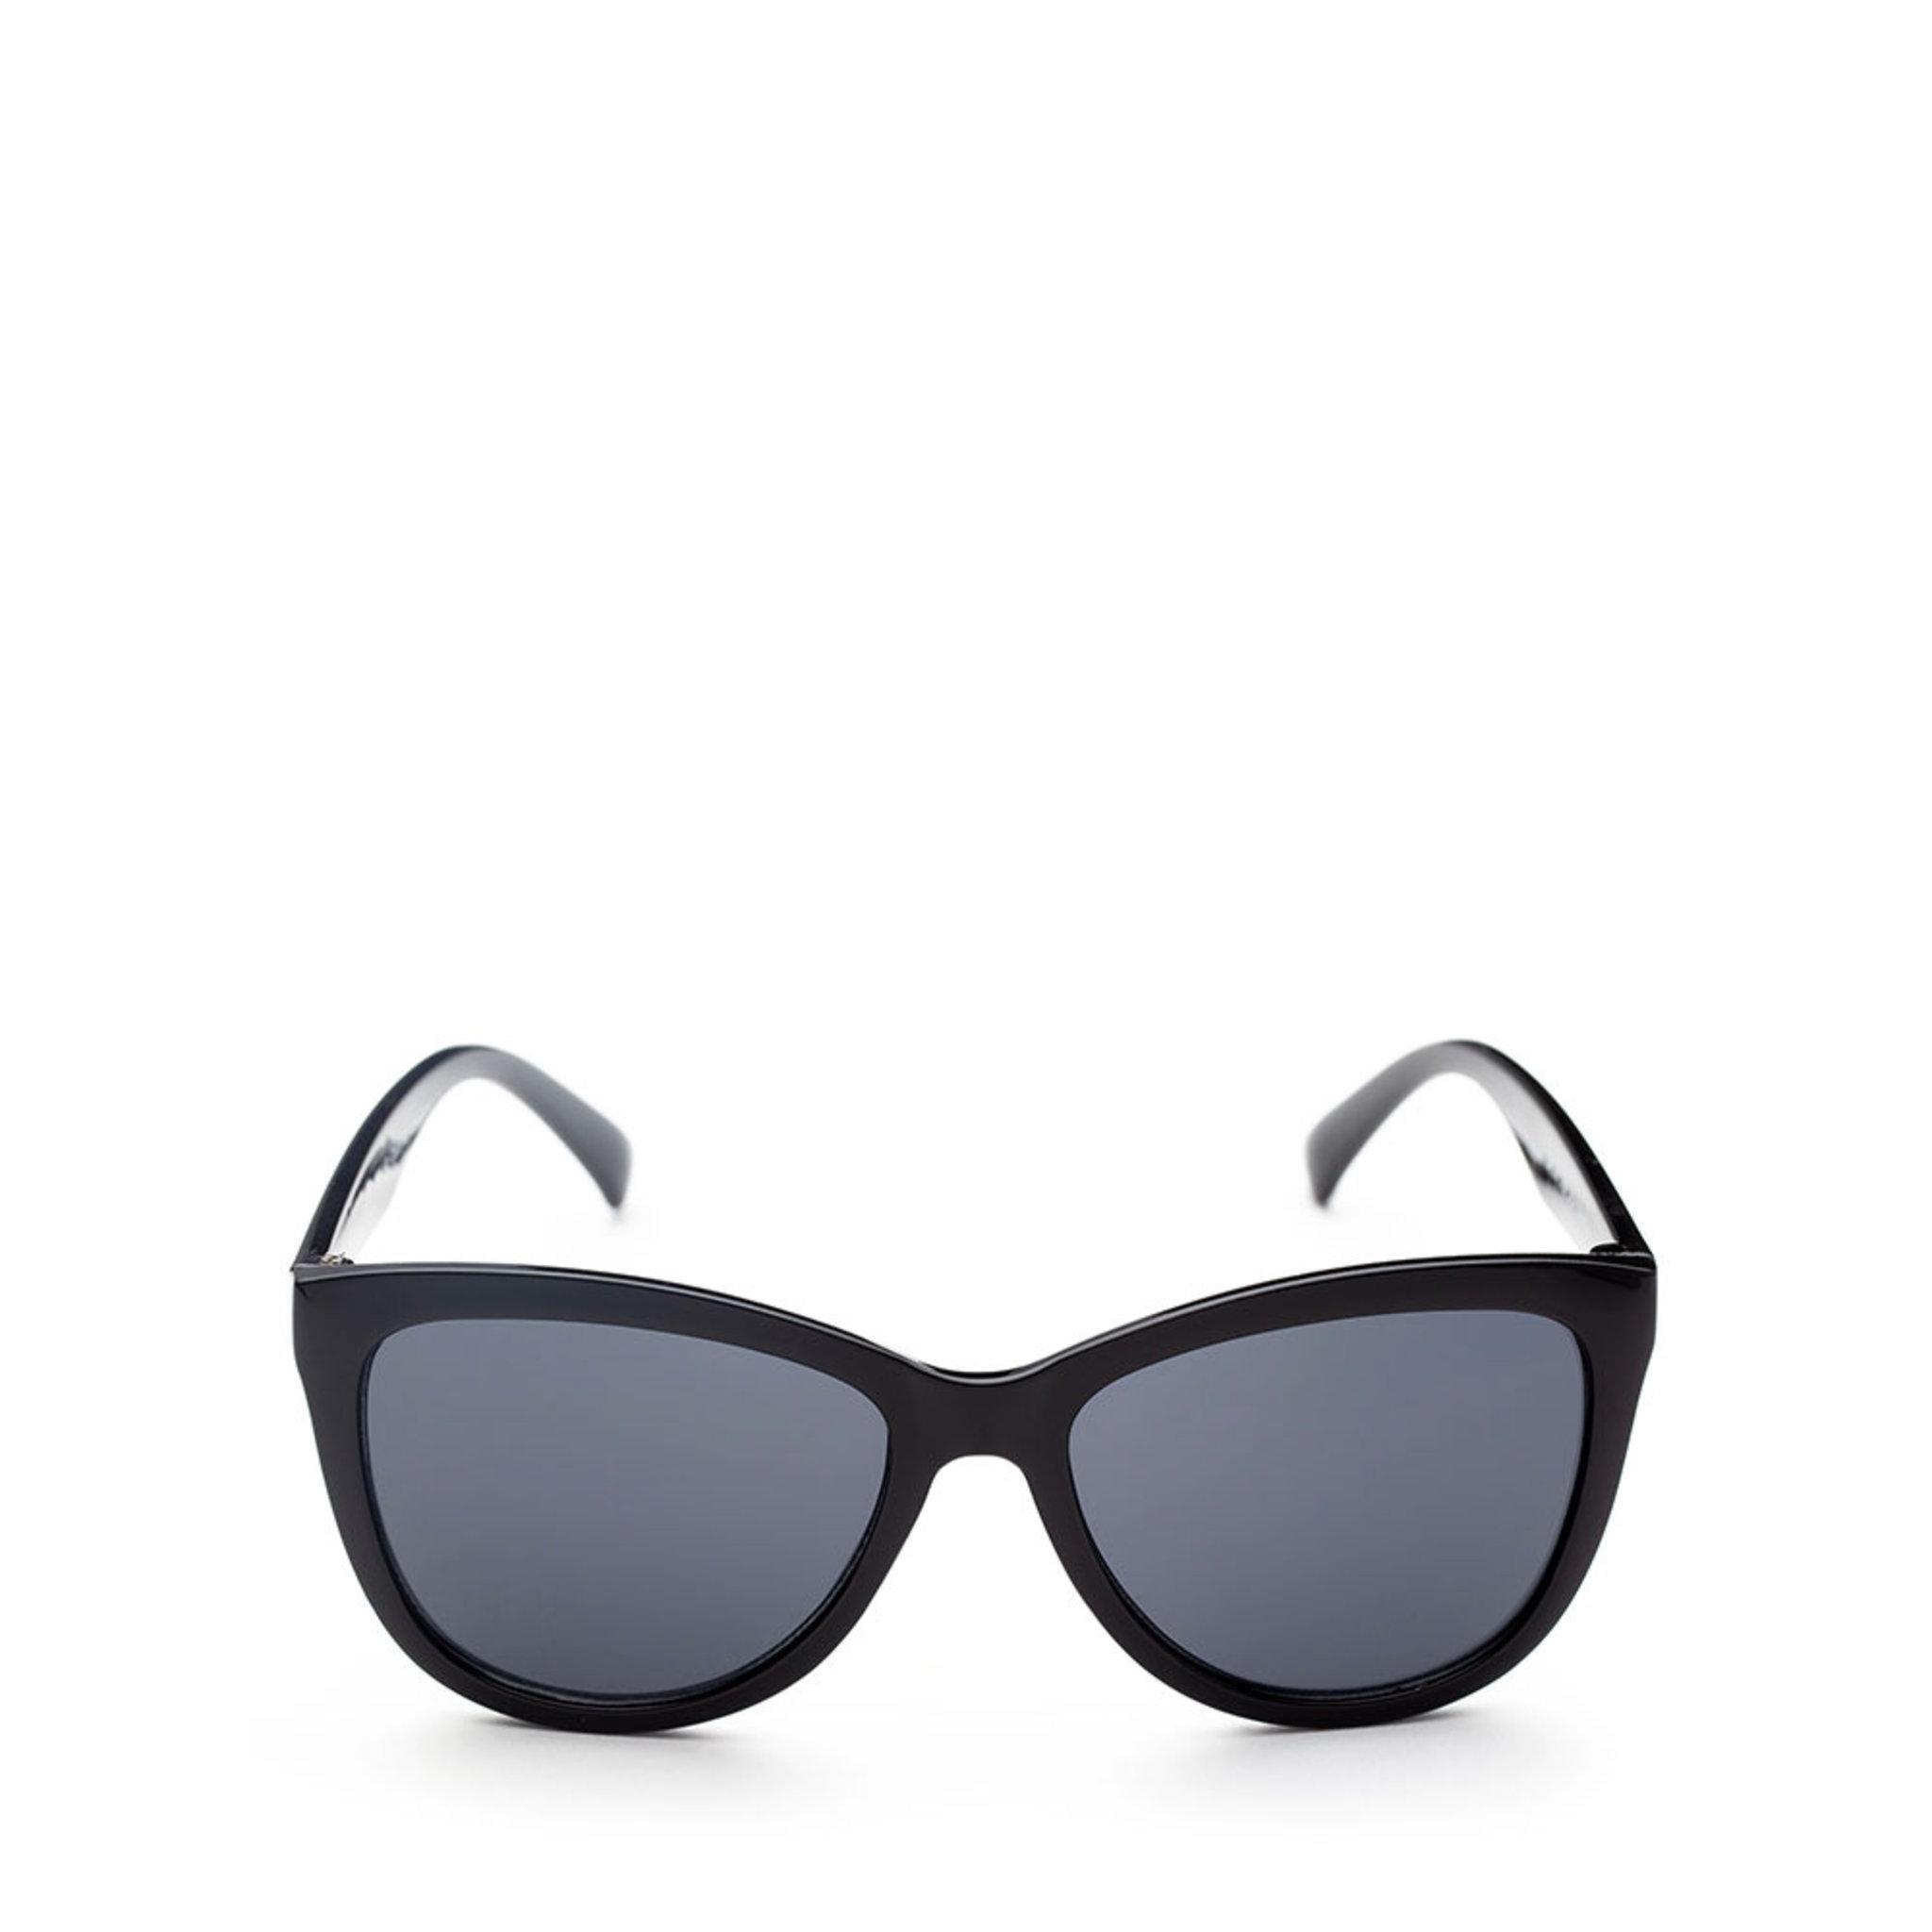 Zandra barnsolglasögon